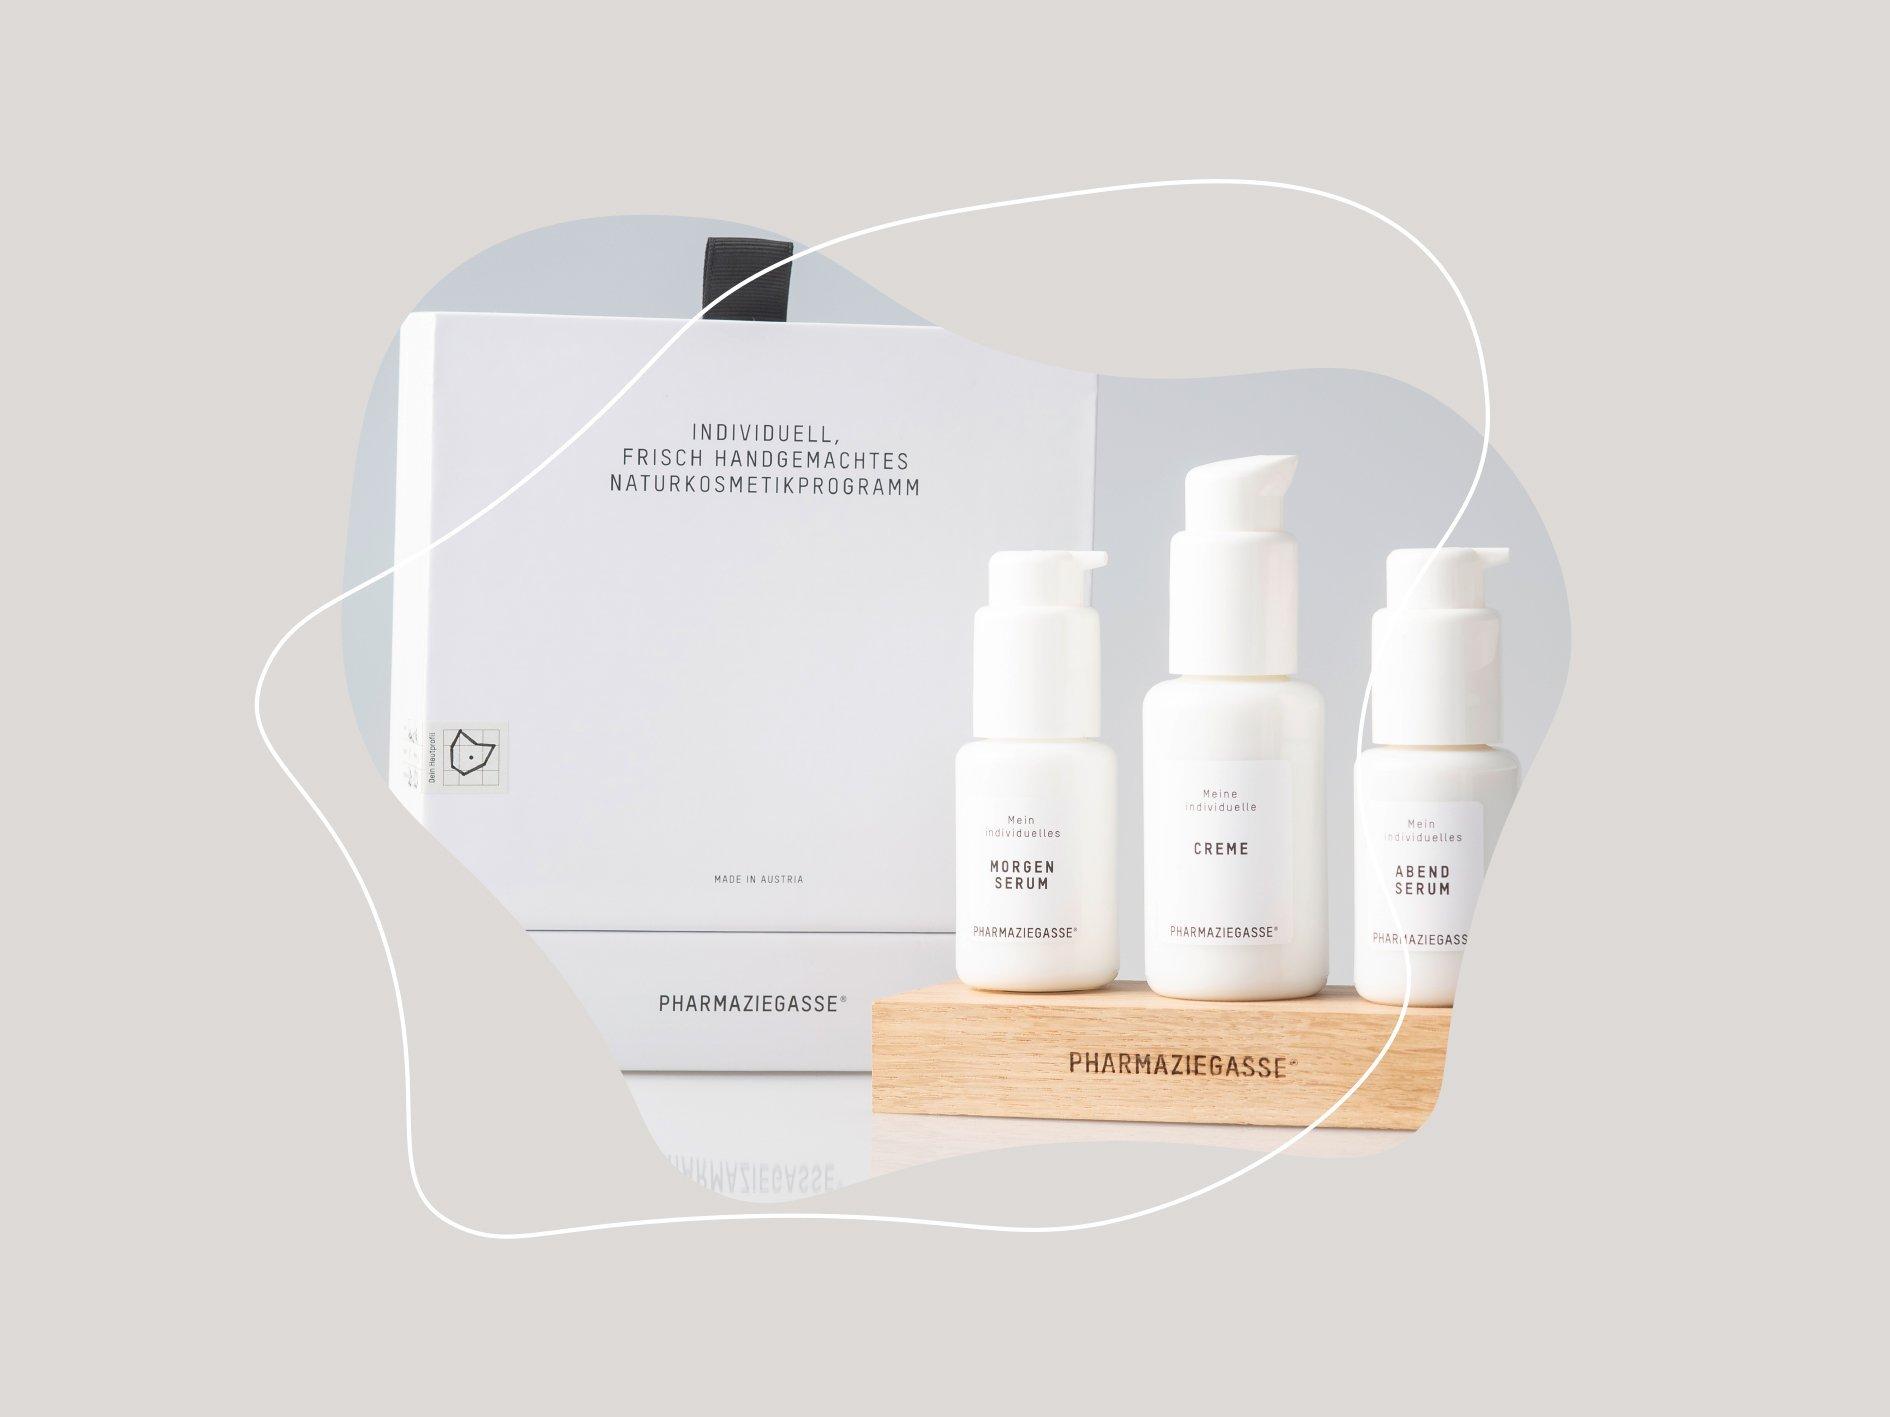 PHARMAZIEGASSE Hautpflege mit Naturkosmetik